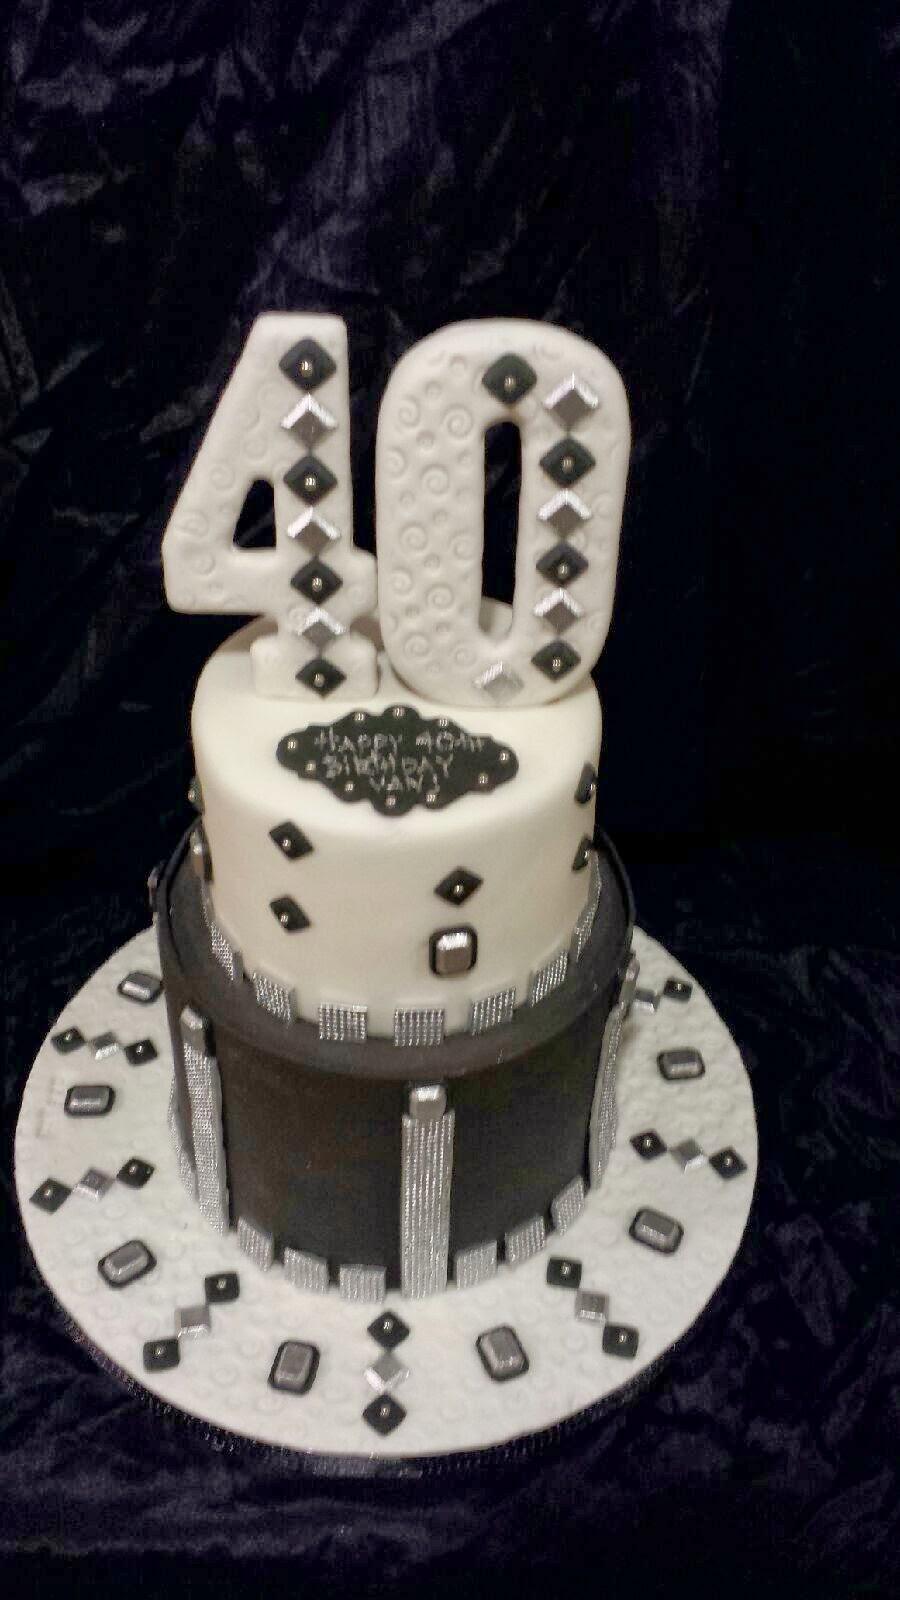 The Sin City Mad Baker Van S 40th Birthday Cake In Black